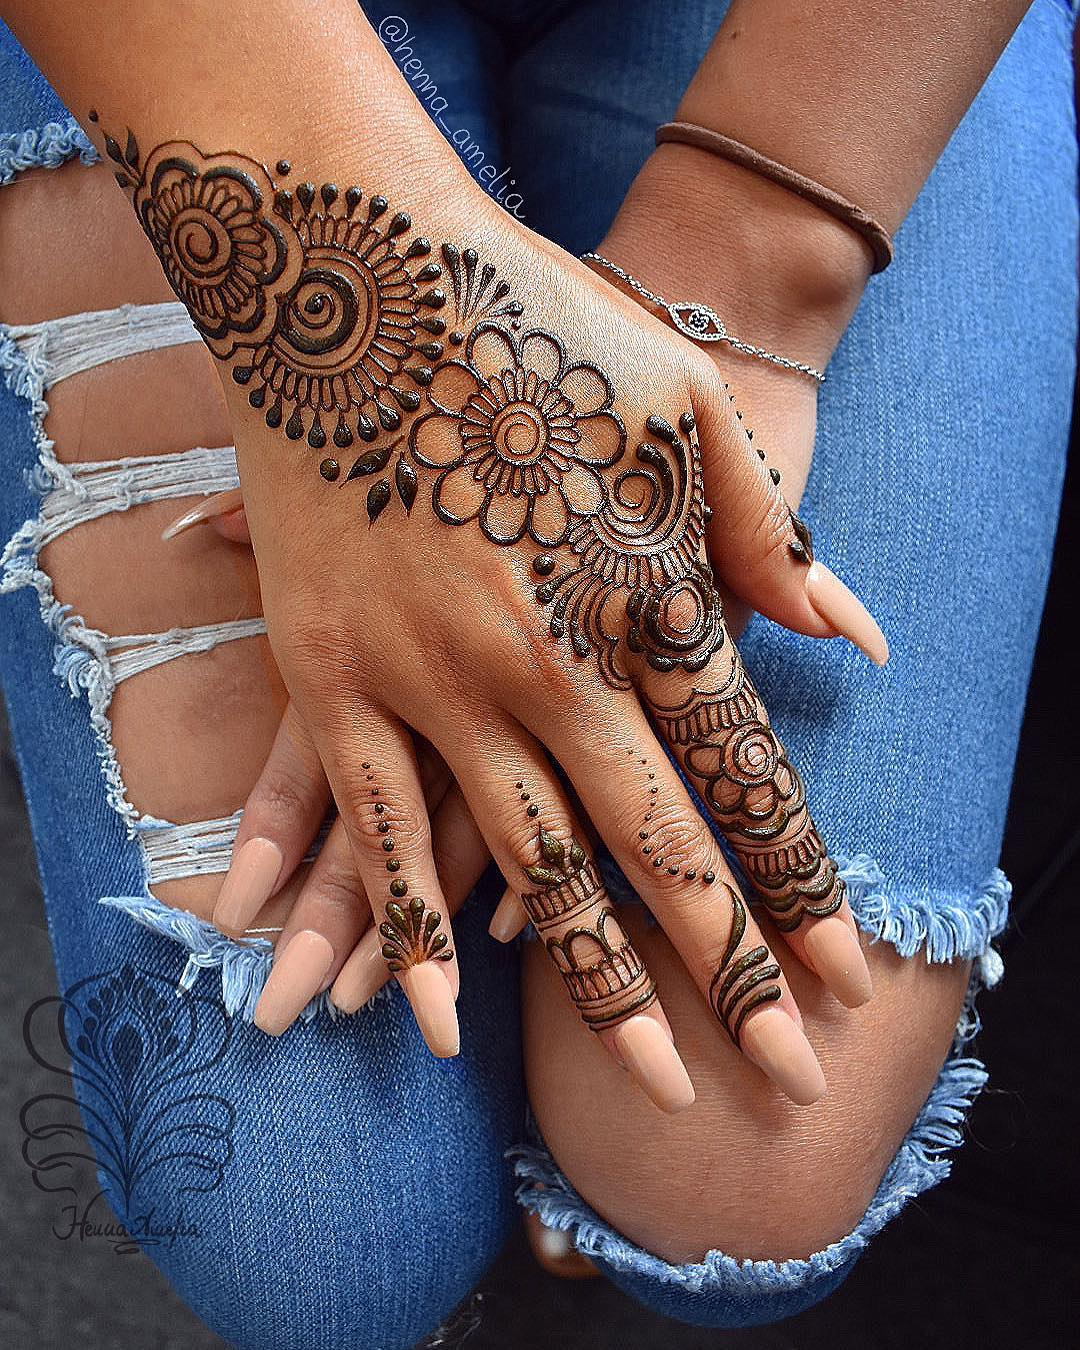 Arabic Mehndi Design Hand Easy Mehndi Designs Collection for Hand 2020